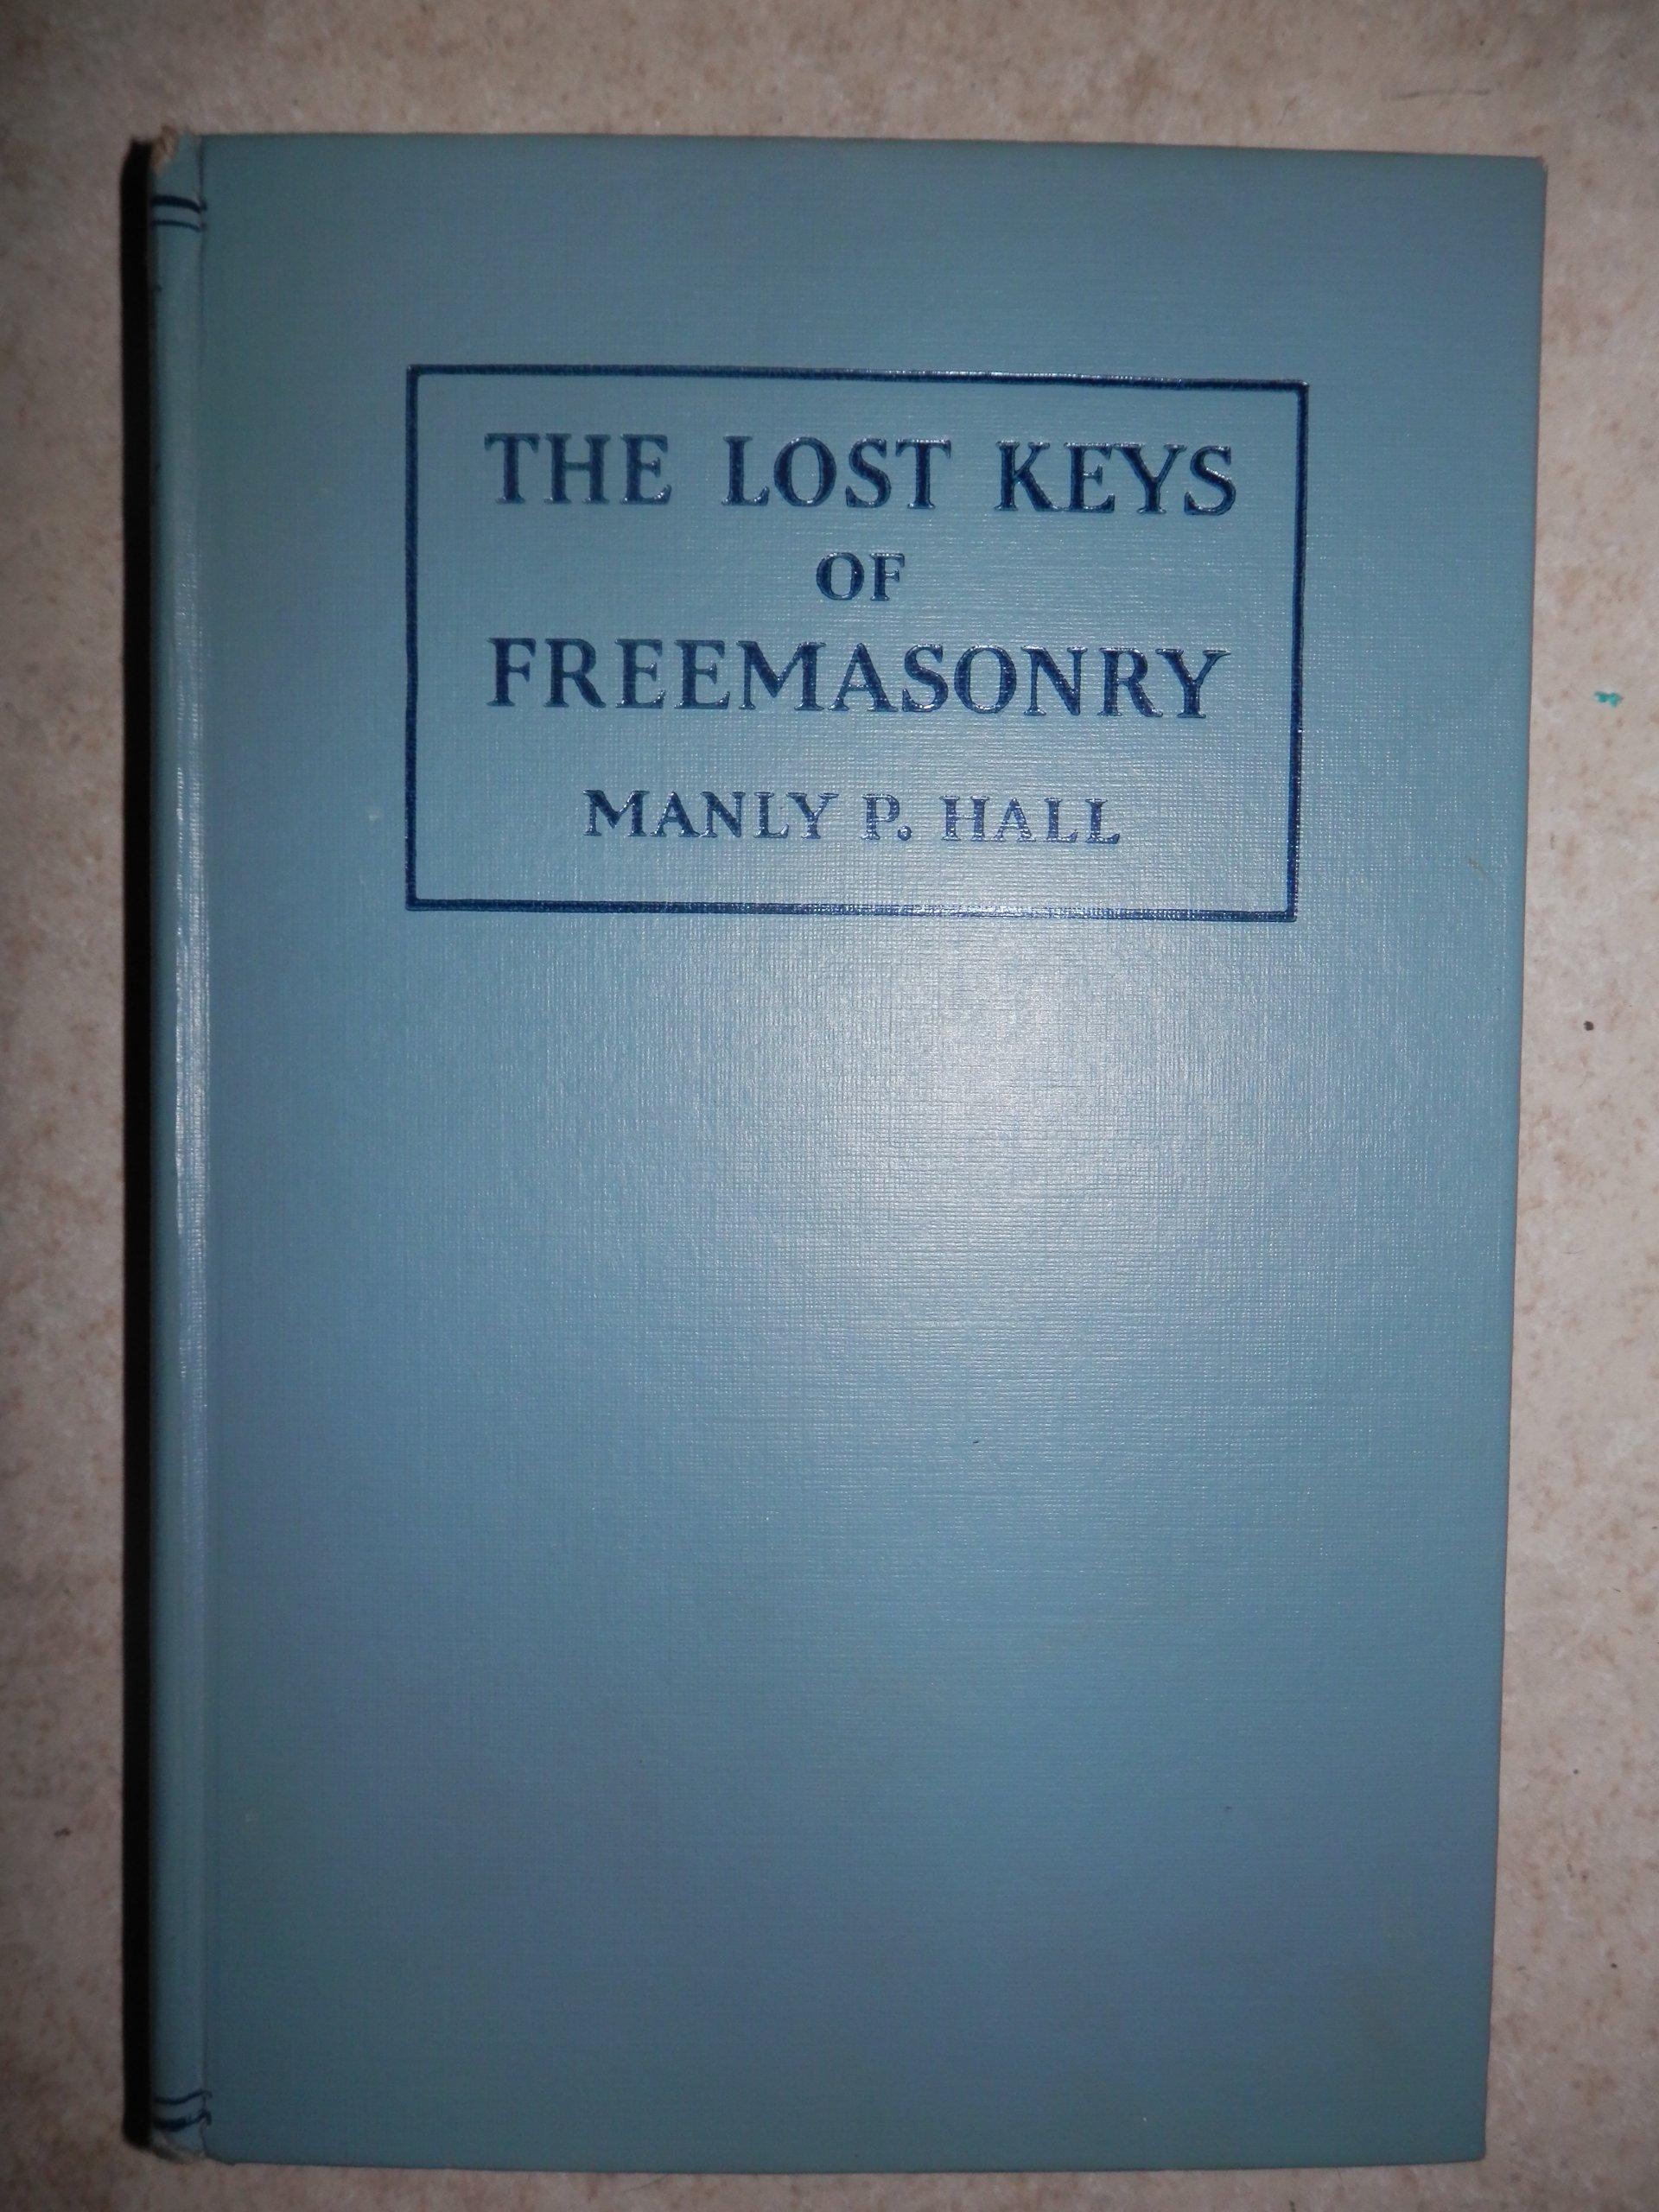 The Lost Keys Of Freemasonry Manly P Hall Amazon Com Books